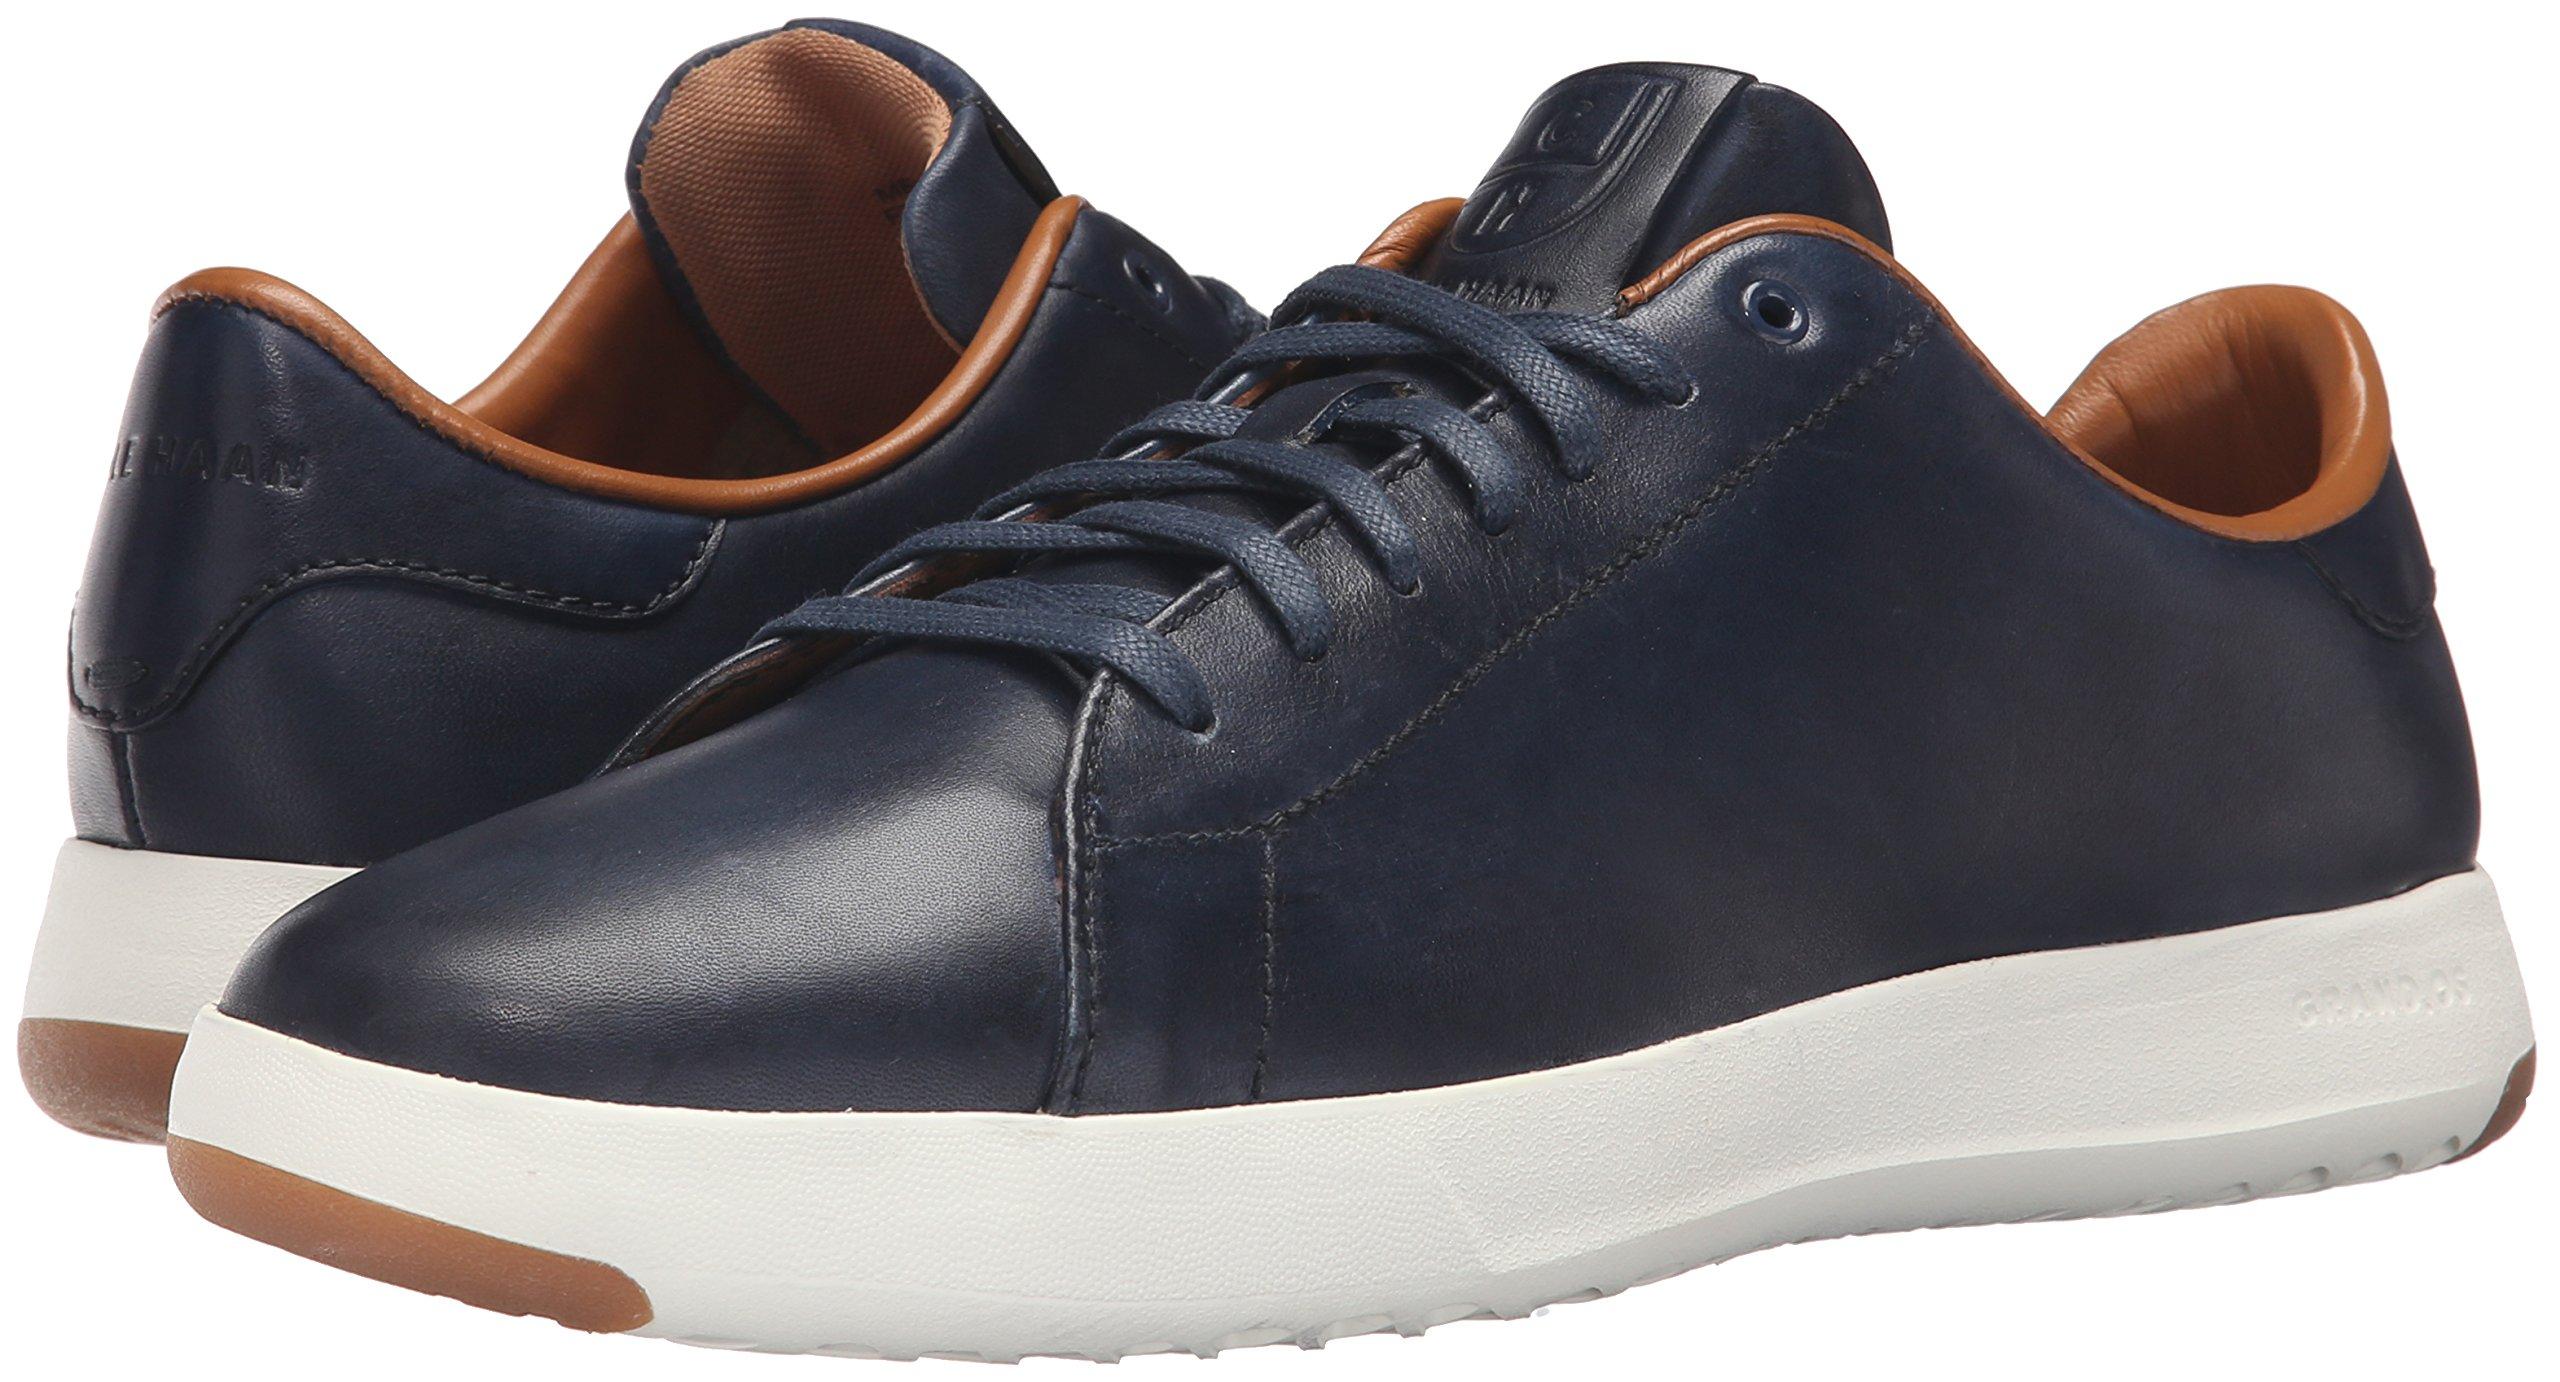 Cole Haan Men's Grandpro Tennis Fashion Sneaker, Blazer Blue Hand Stain, 7 M US by Cole Haan (Image #6)